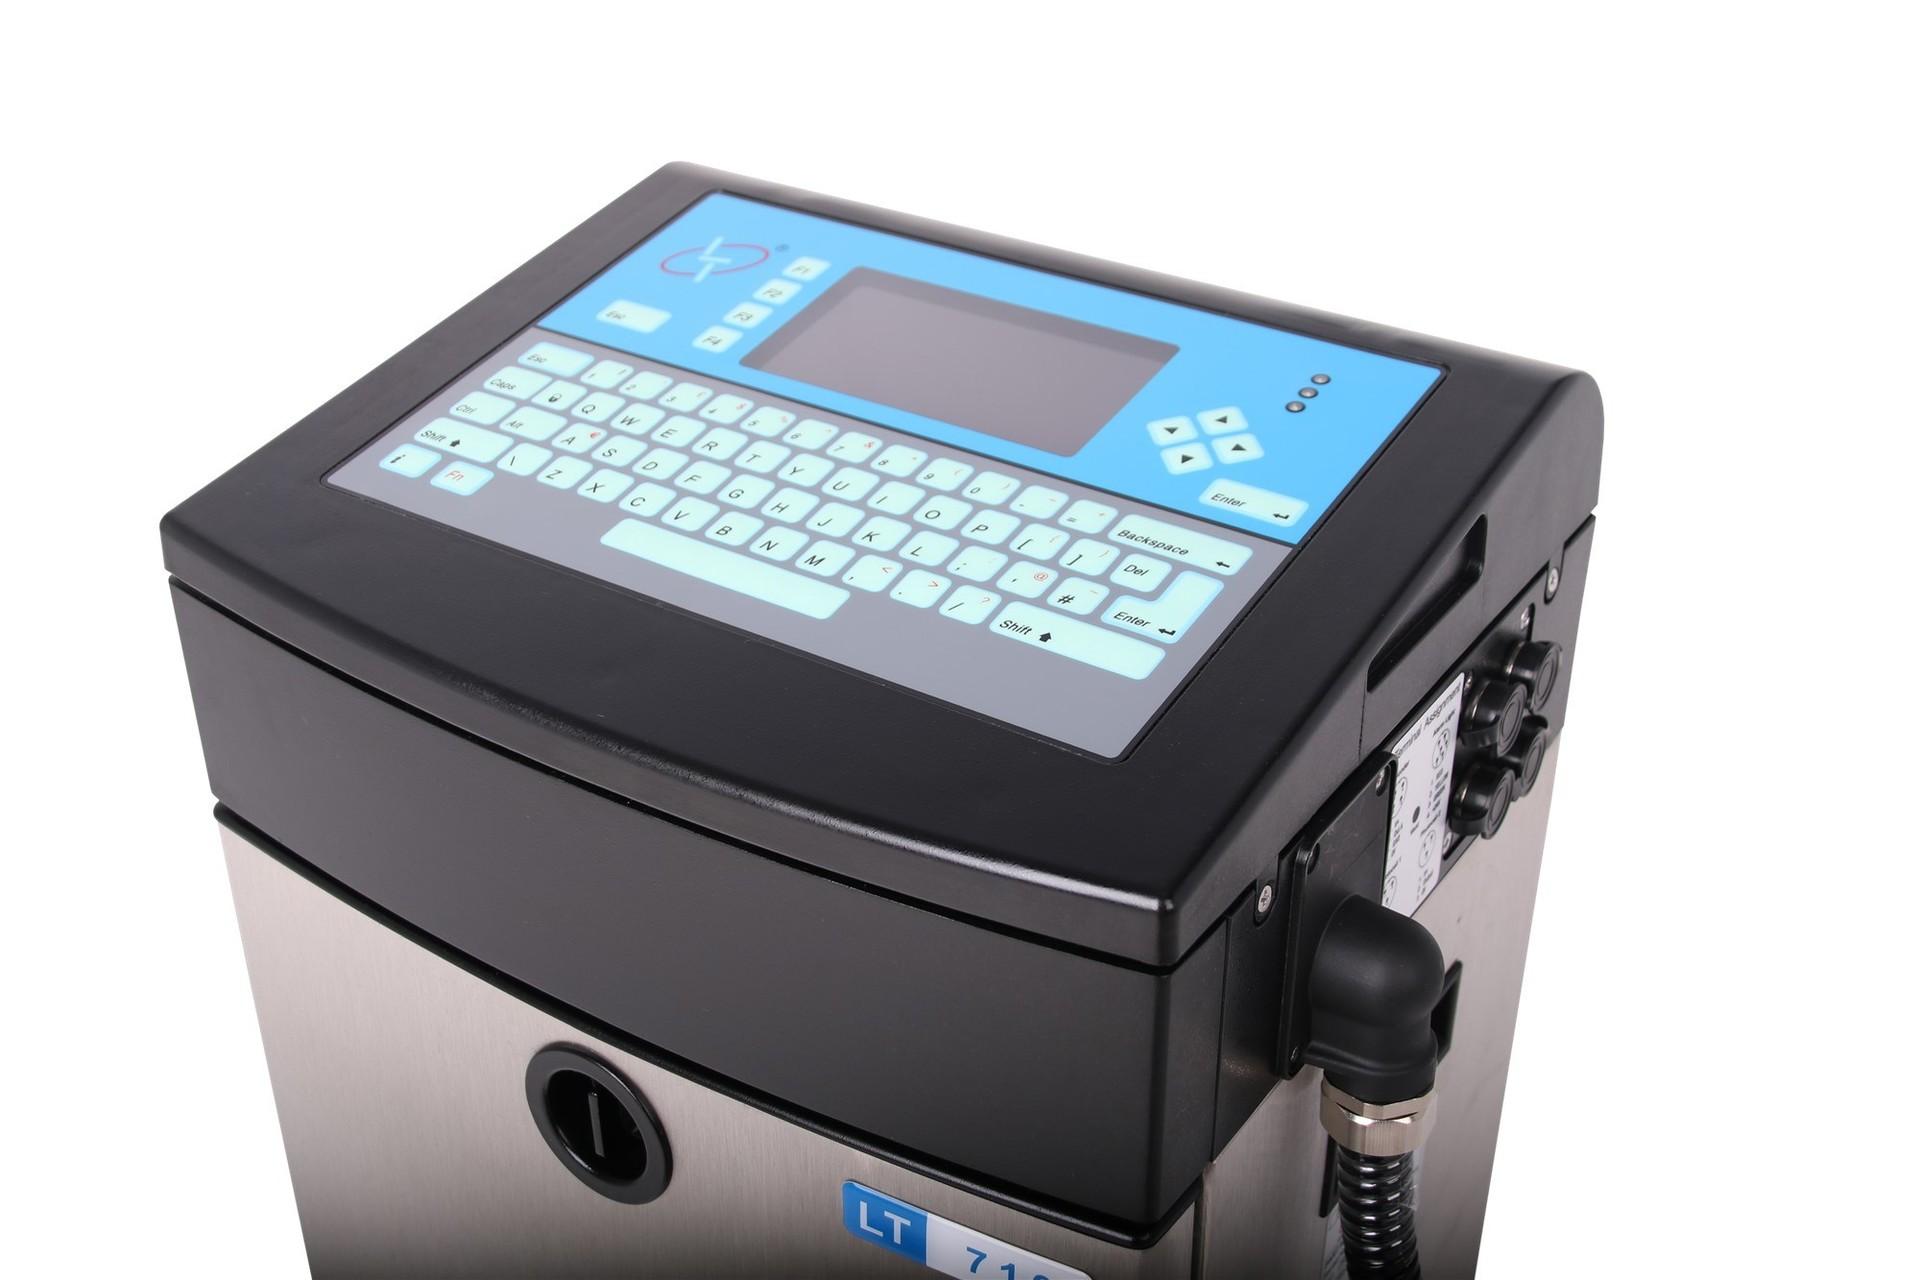 Lead Tech Lt710 Cij Inkjet Printer for Moving Head Printing